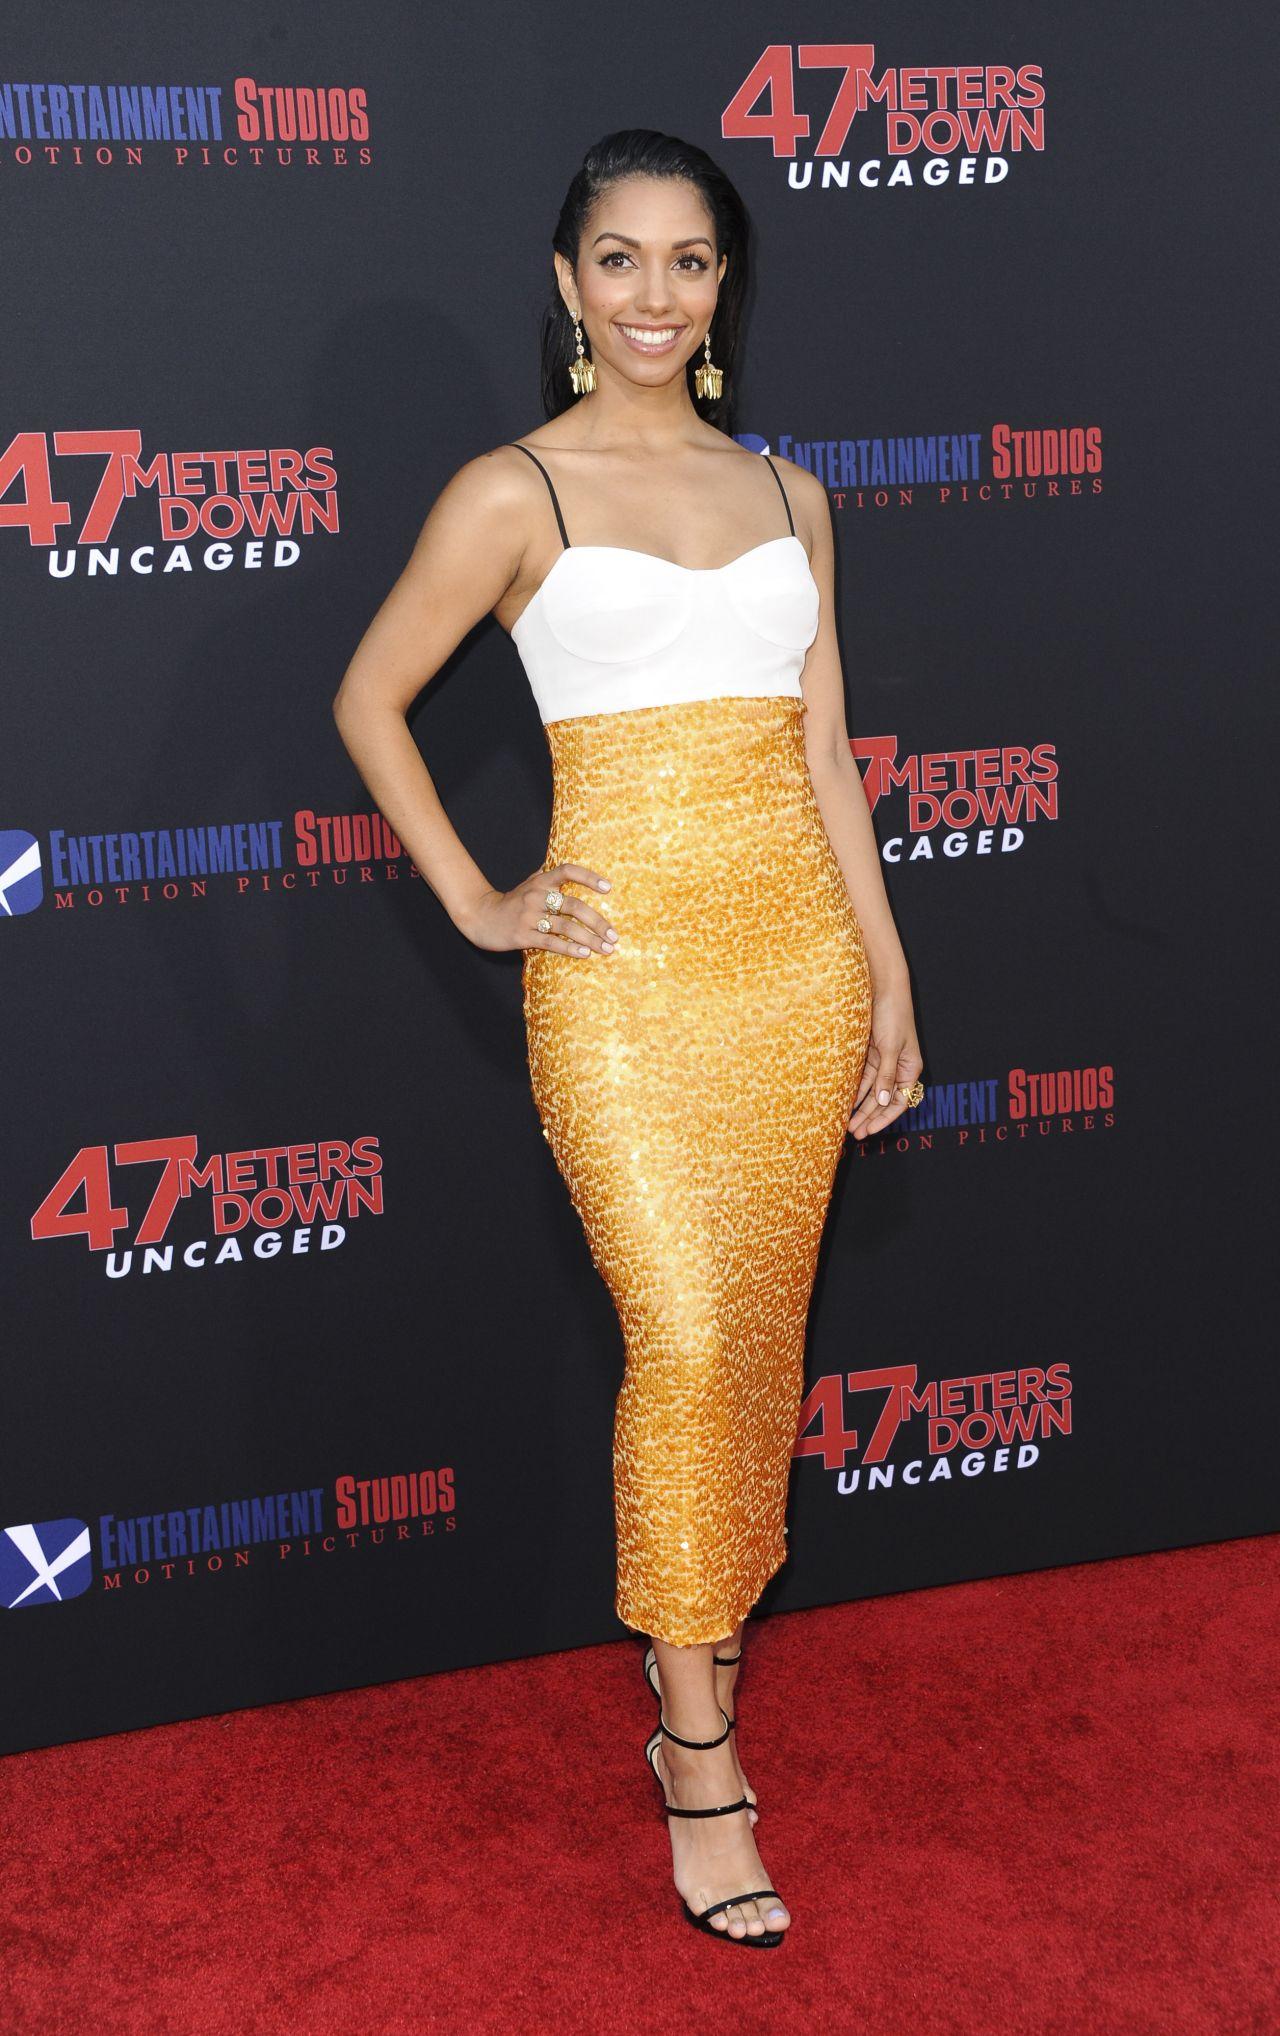 Corinne Foxx 47 Meters Down Uncaged Premiere In Los